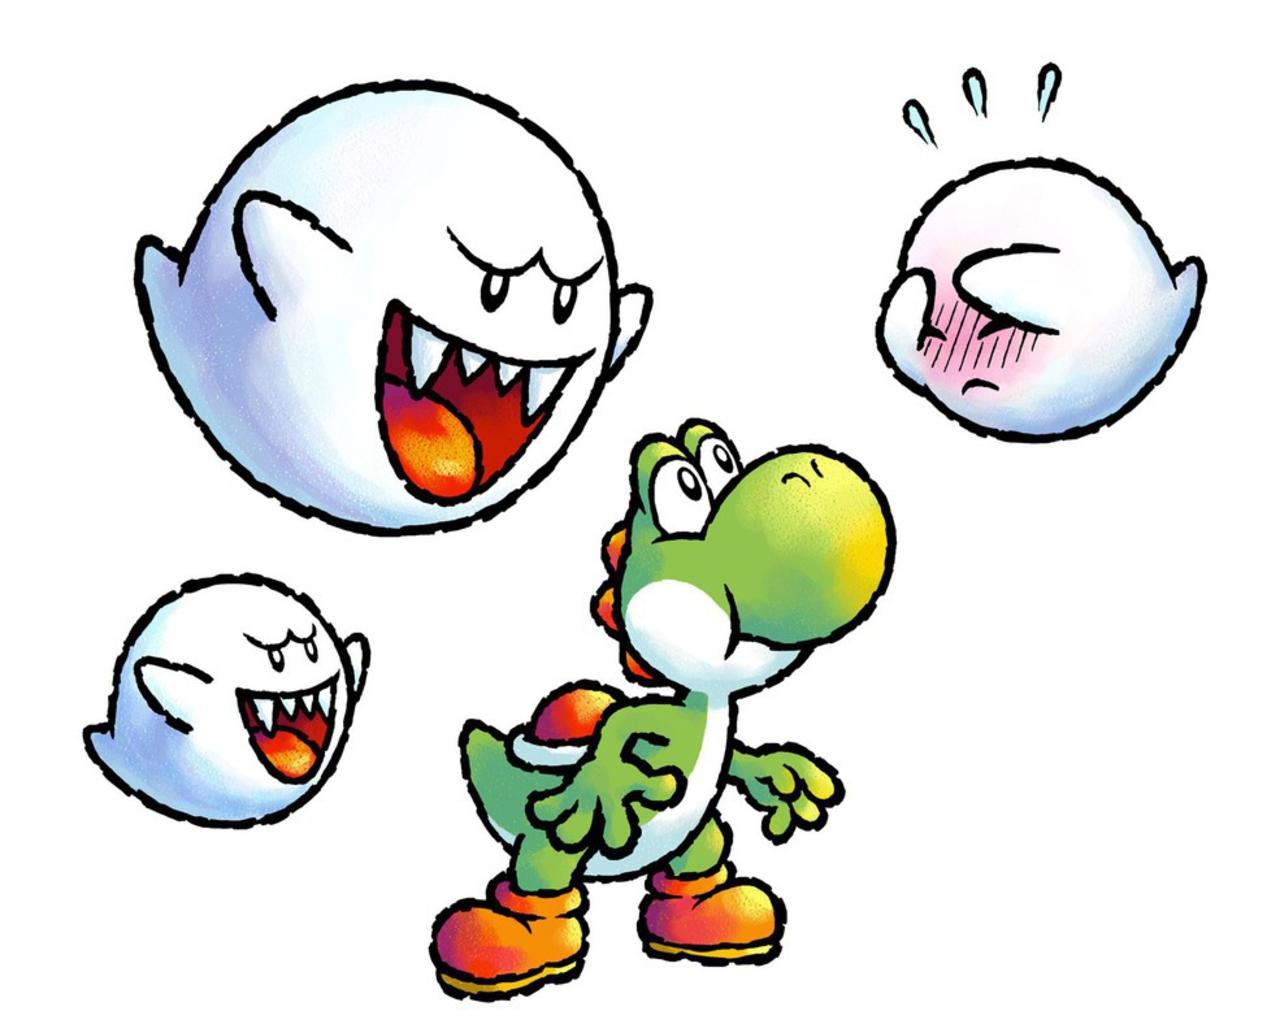 Yoshi And Boo Nintendo Villains Fondo De Pantalla 25771915 Fanpop